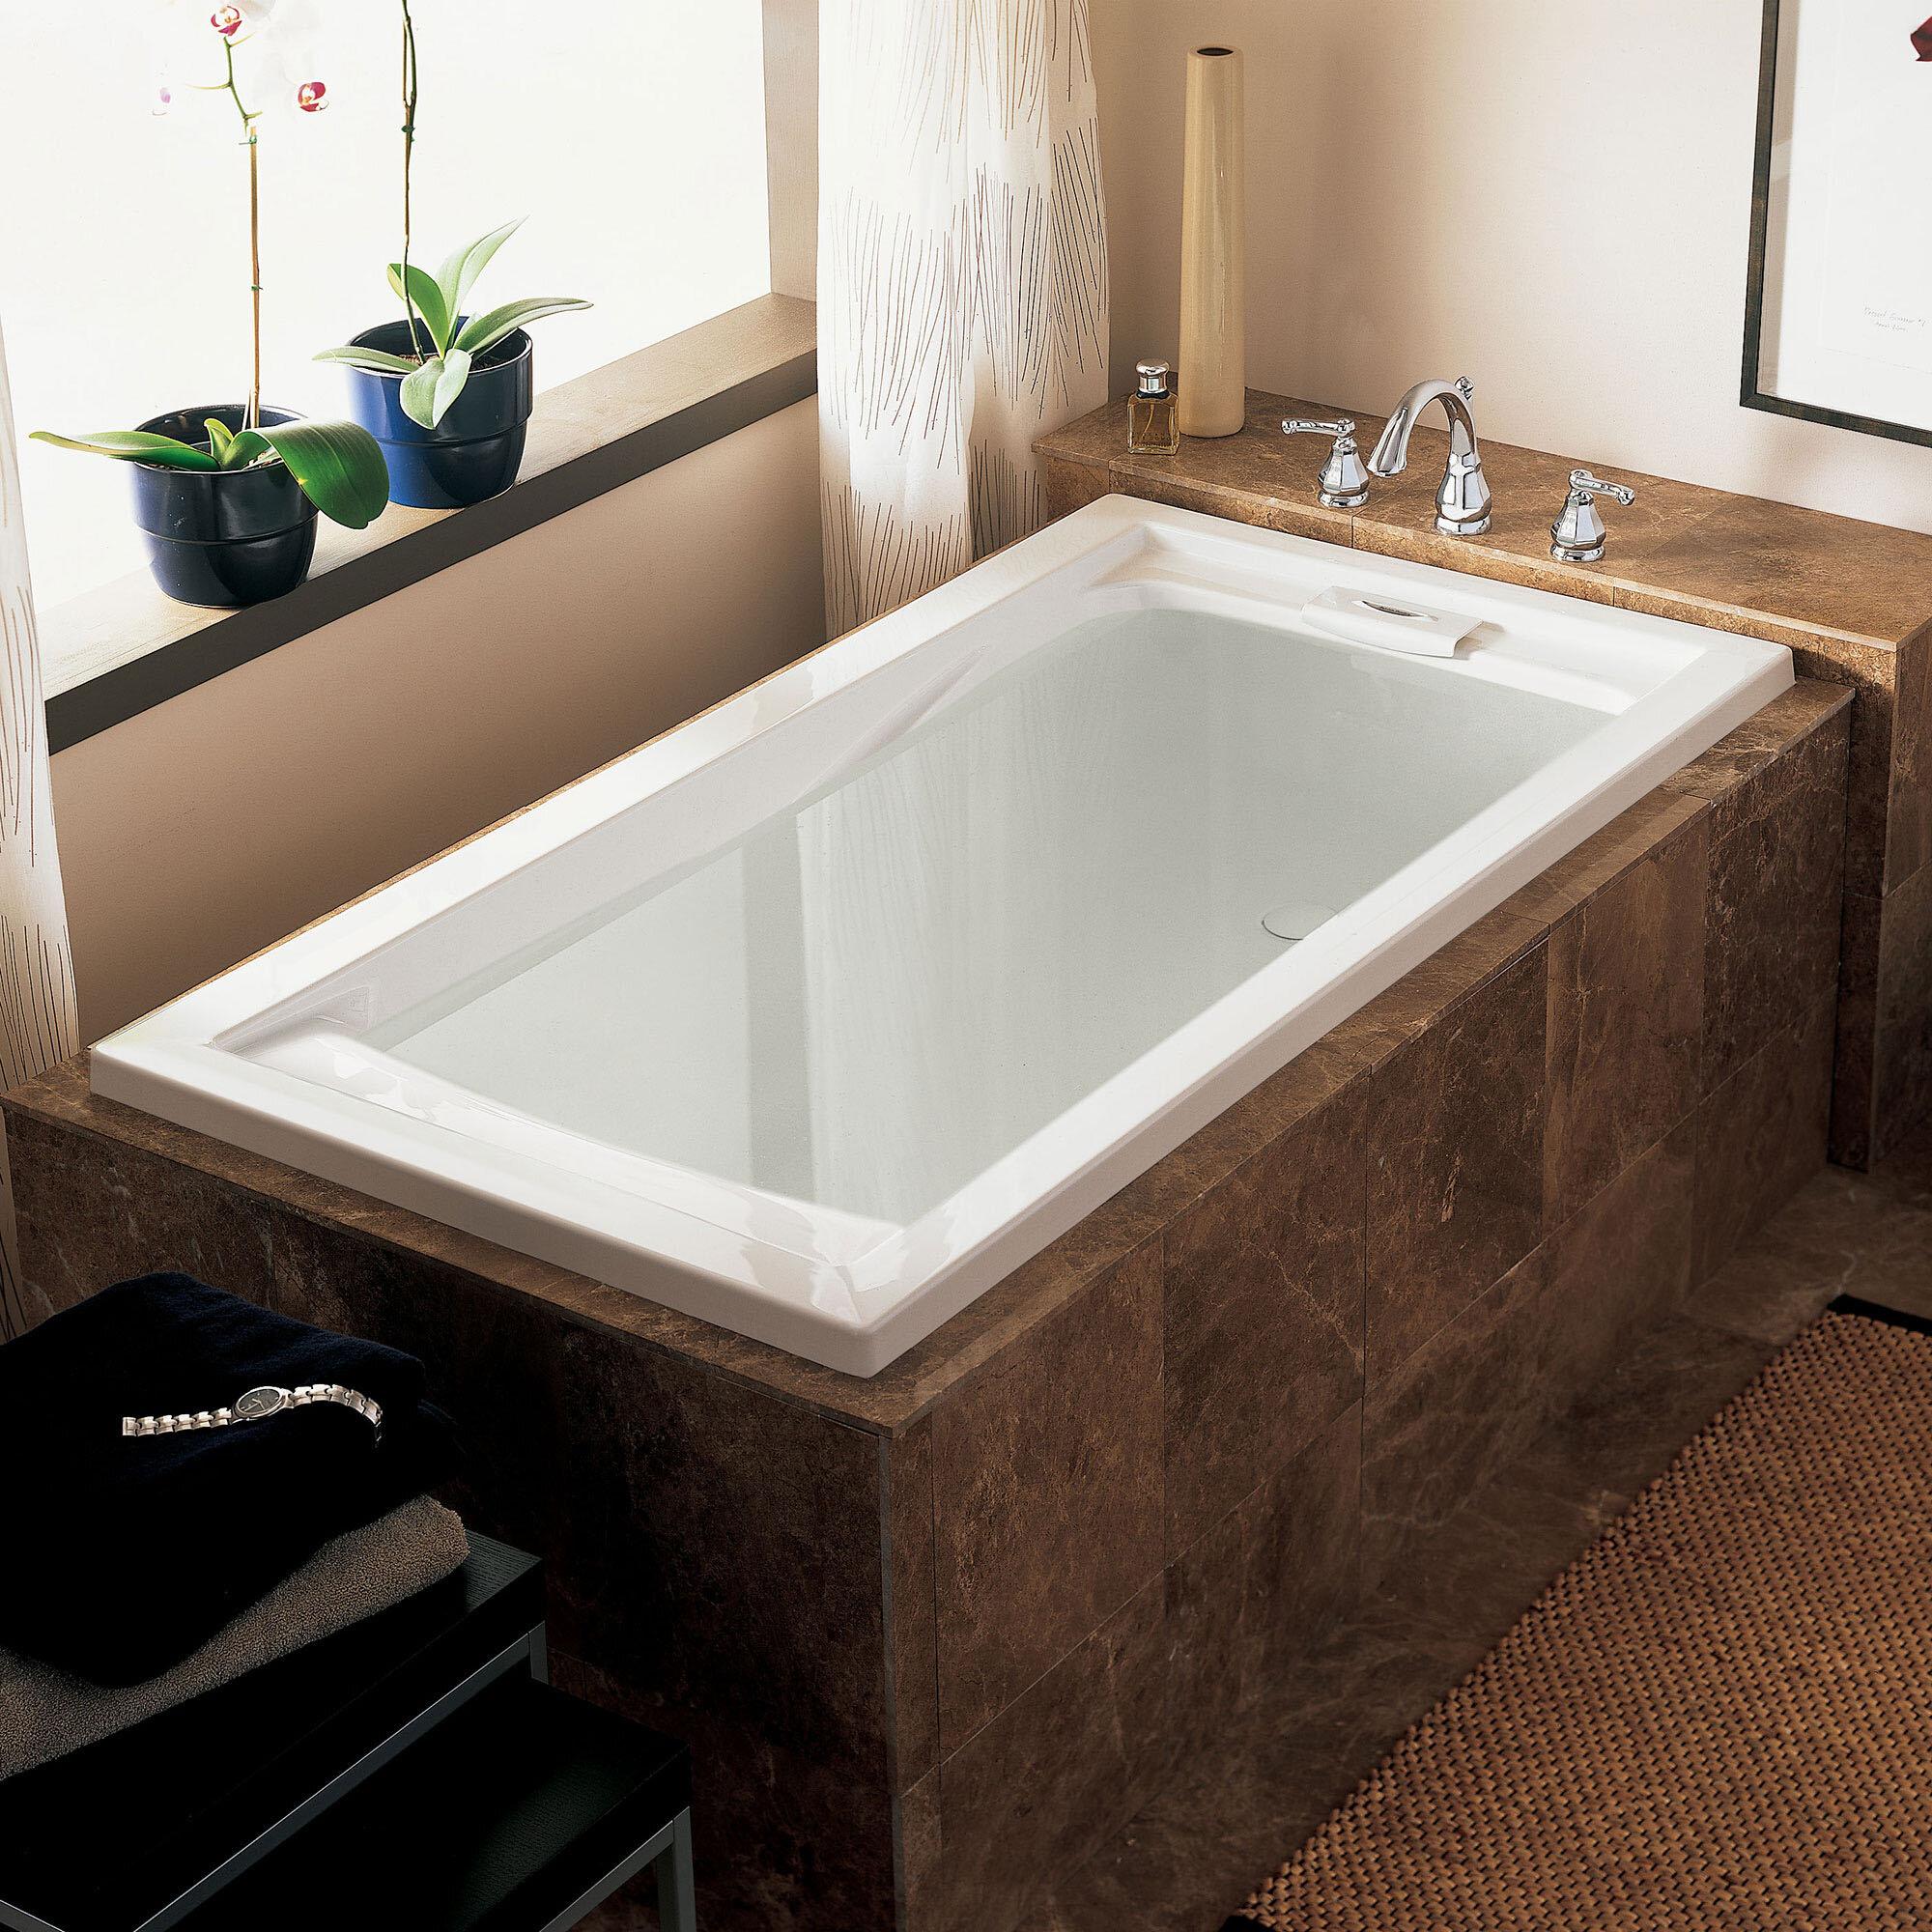 American Standard Evolution 60 X 32 Drop In Whirlpool Bathtub Reviews Wayfair Ca